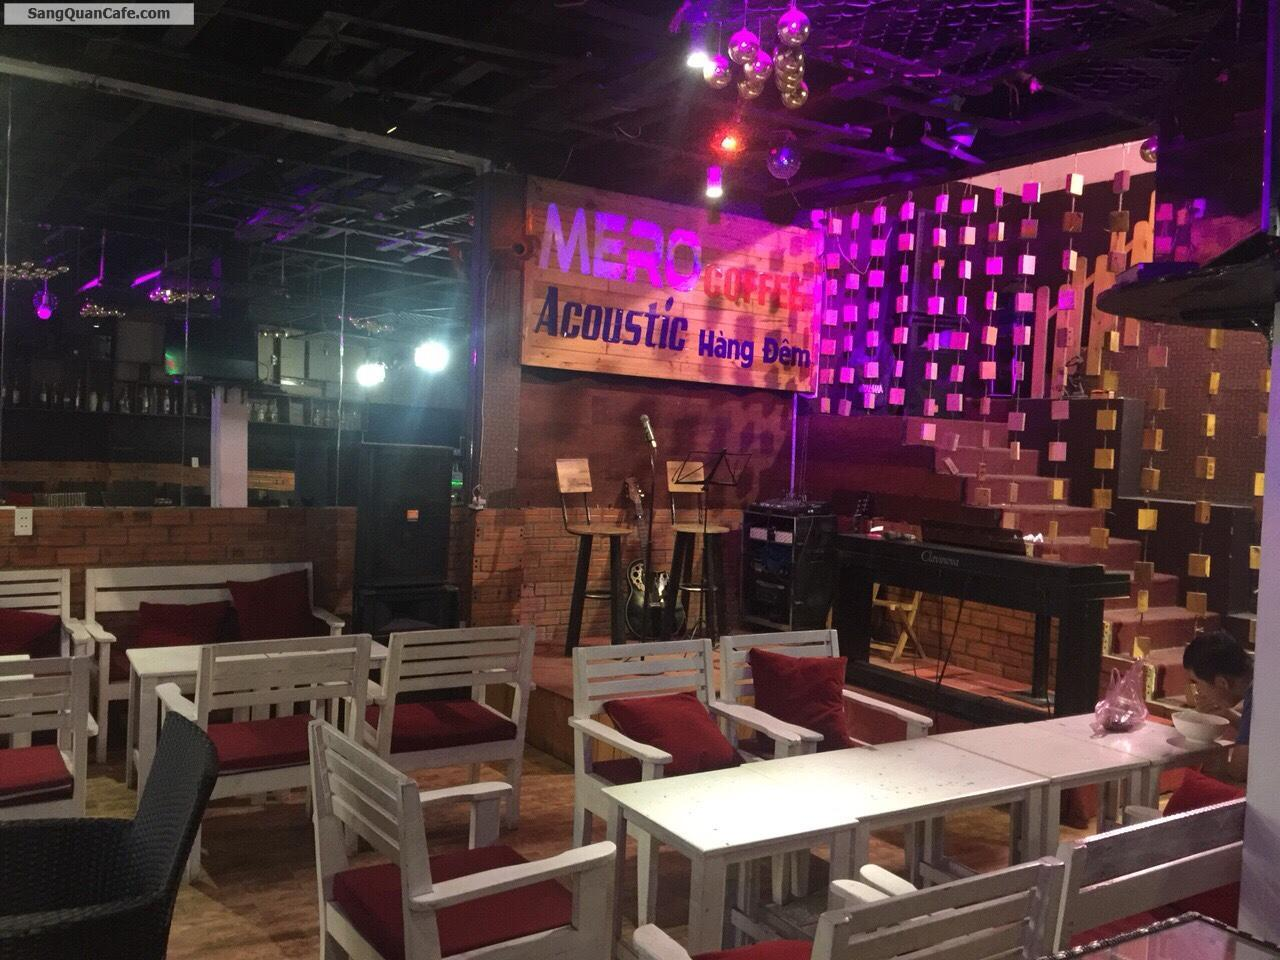 sang-cafe-bar-acoustic-khu-ten-lua-97181.jpg